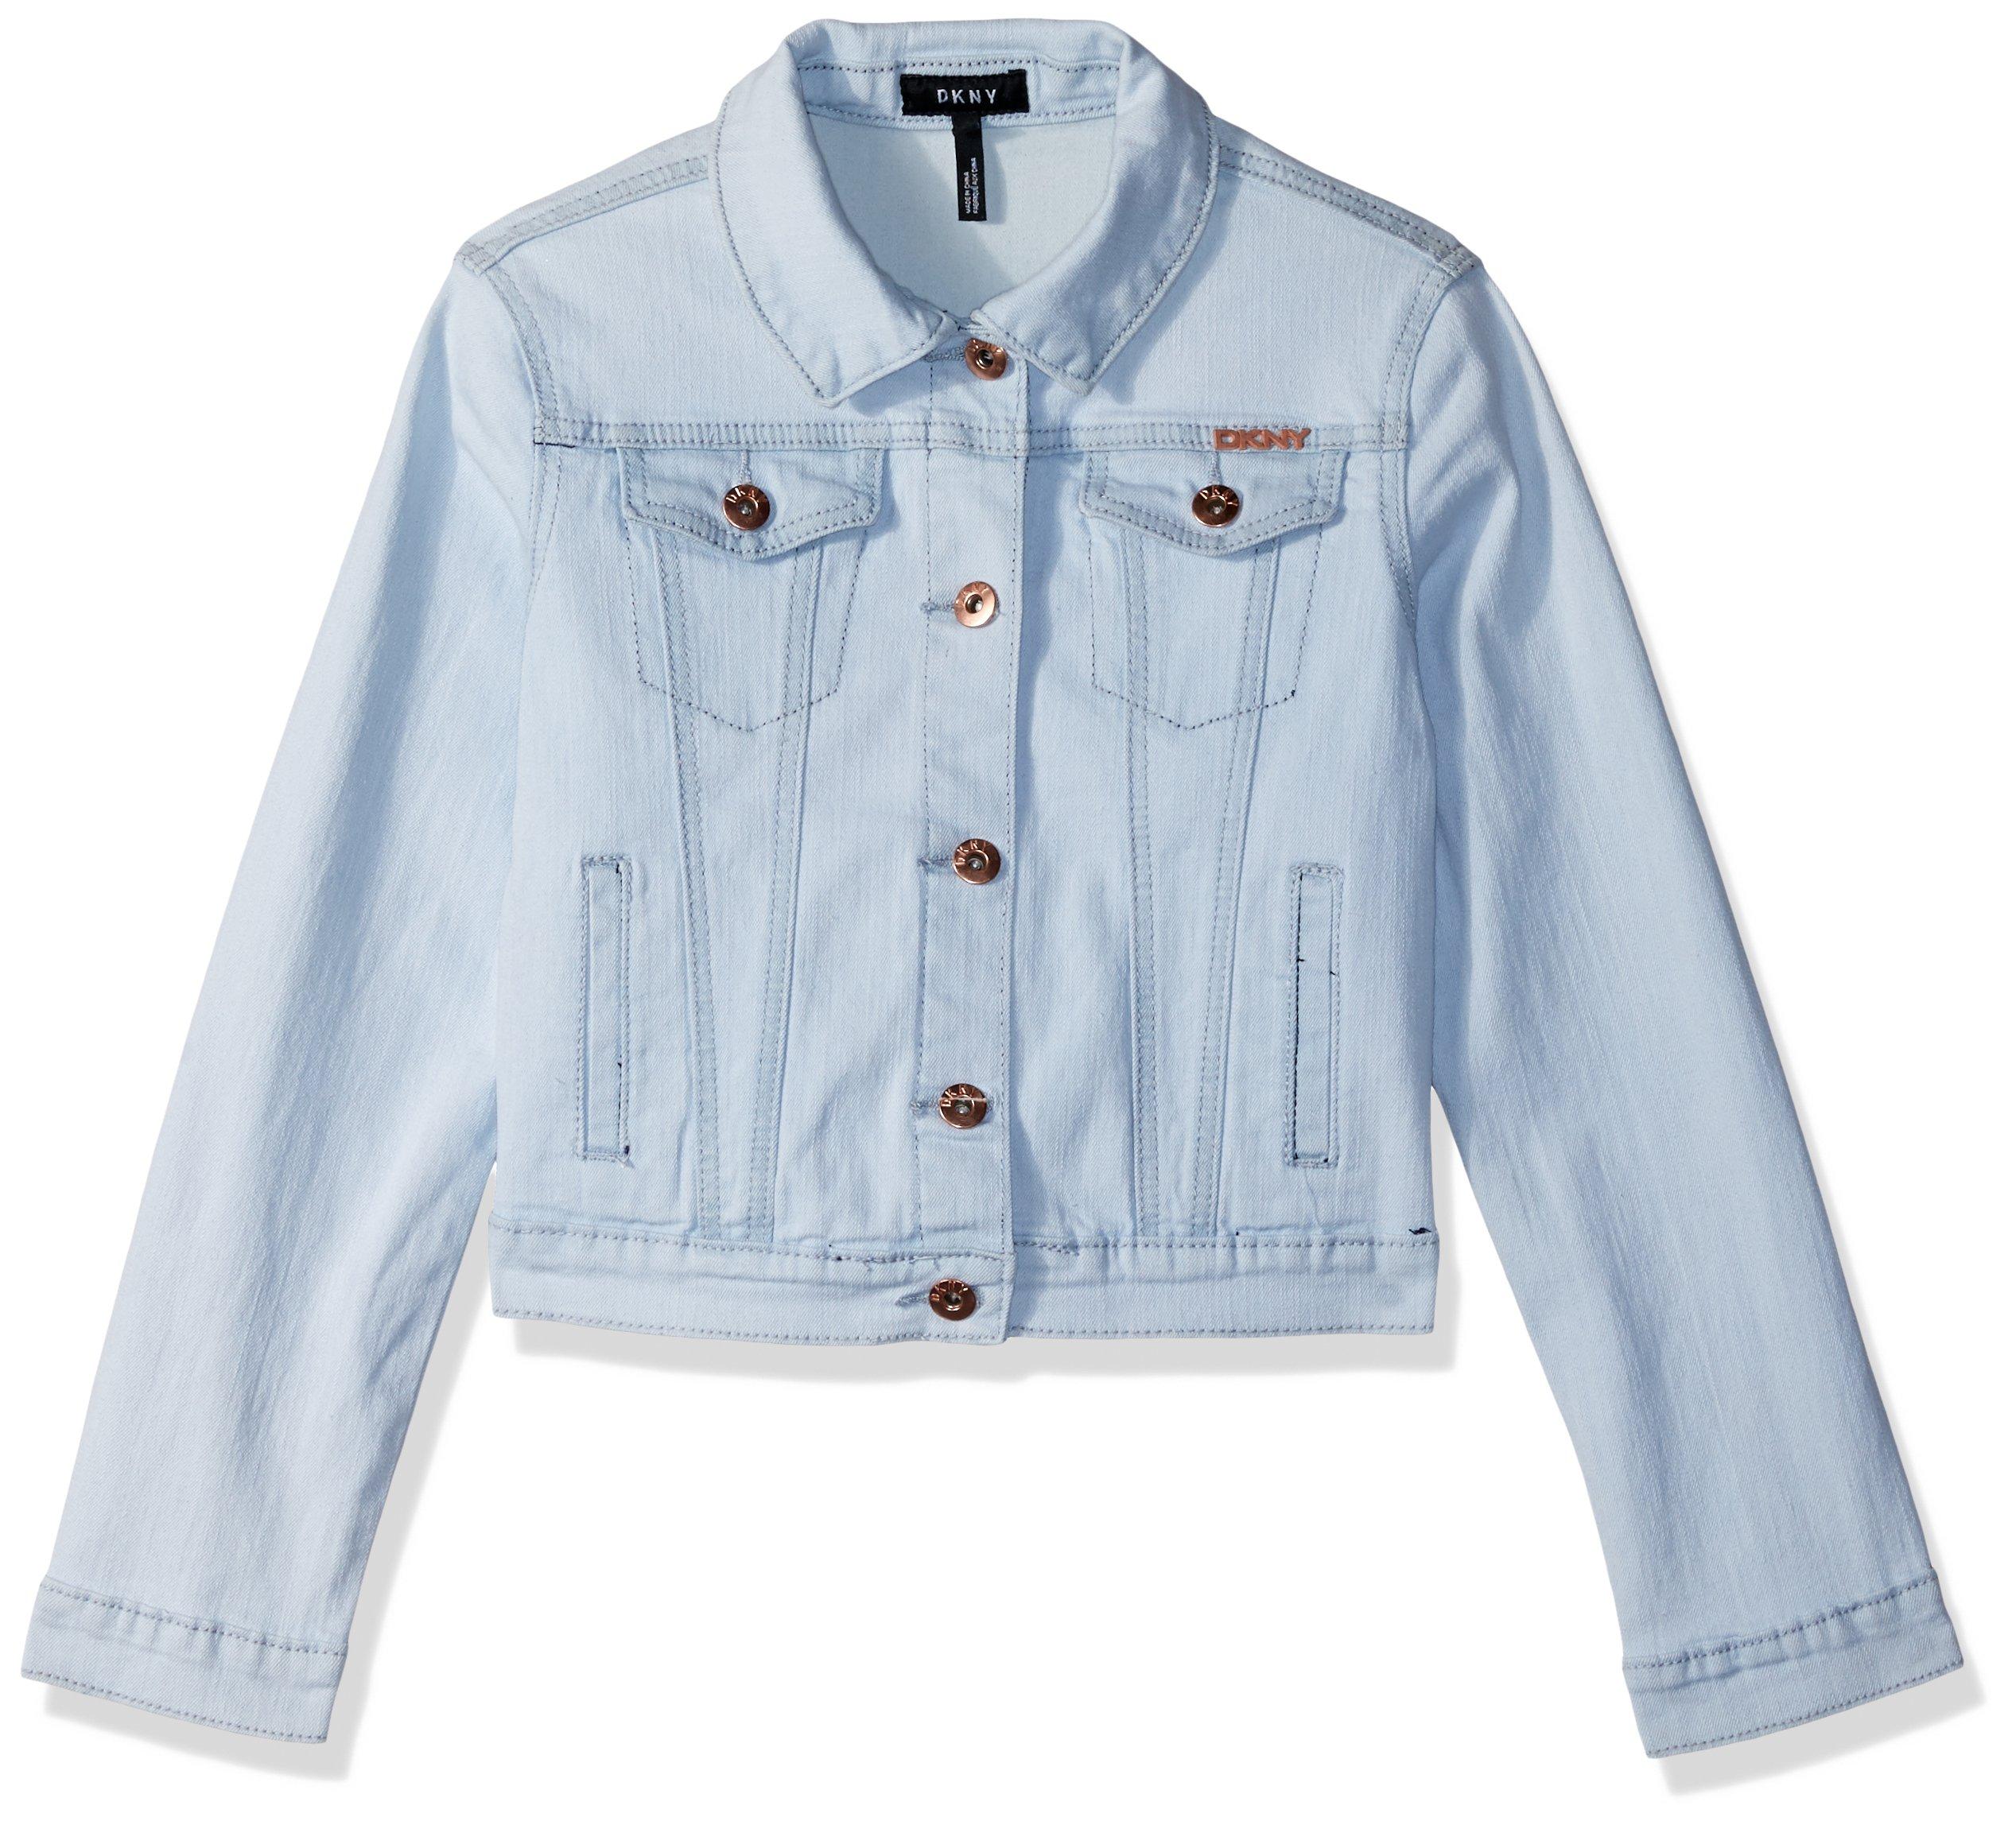 DKNY Toddler Girls' Casual Jacket, Denim Hint of Indigo, 2T